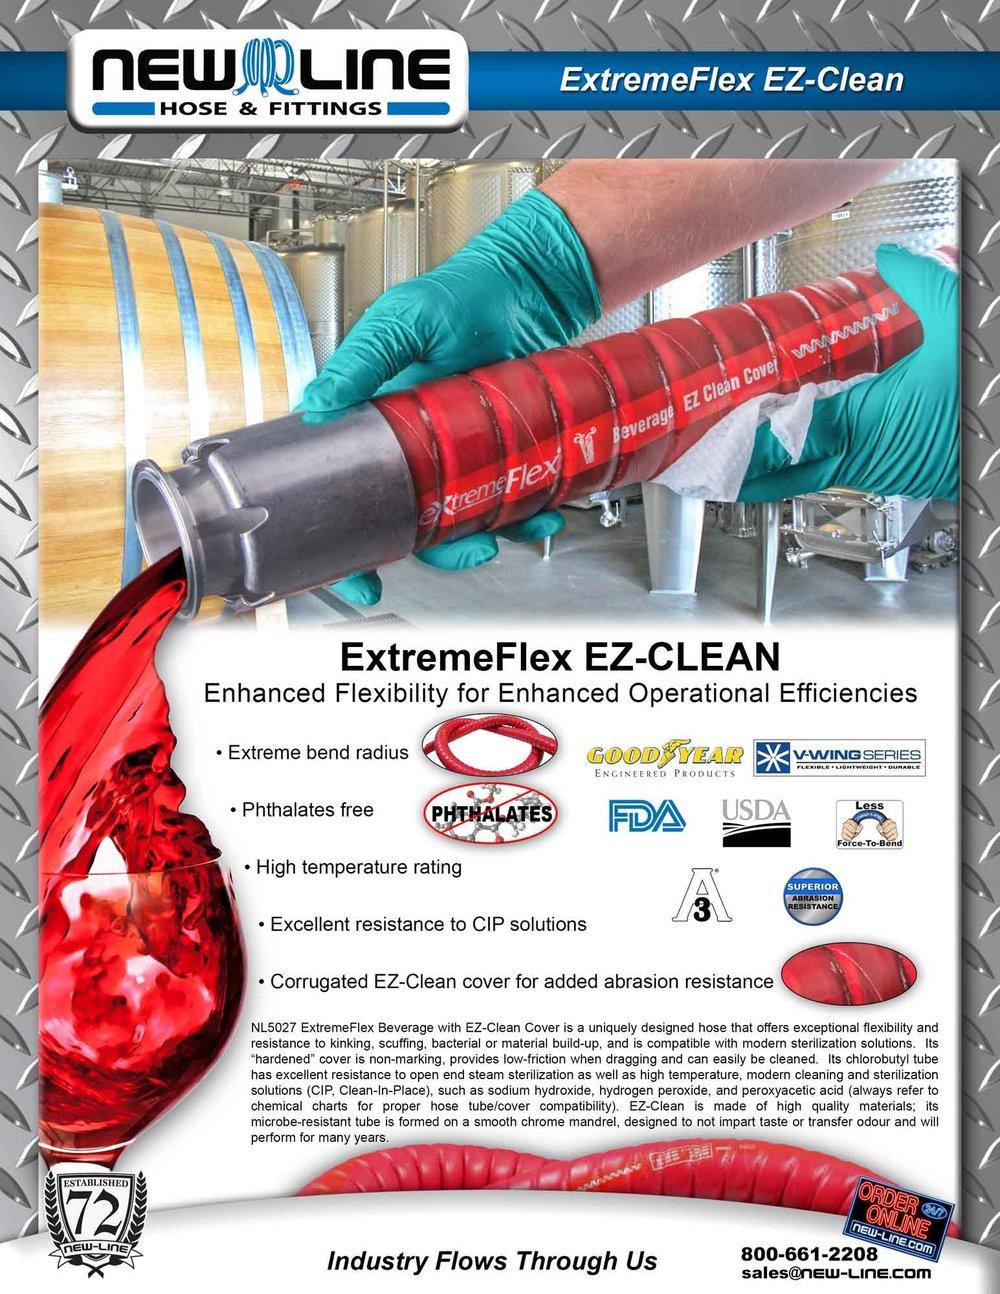 Winery-Flyer----NL5027-GoodYear-EZ-Clean-Aug-27-14.jpg